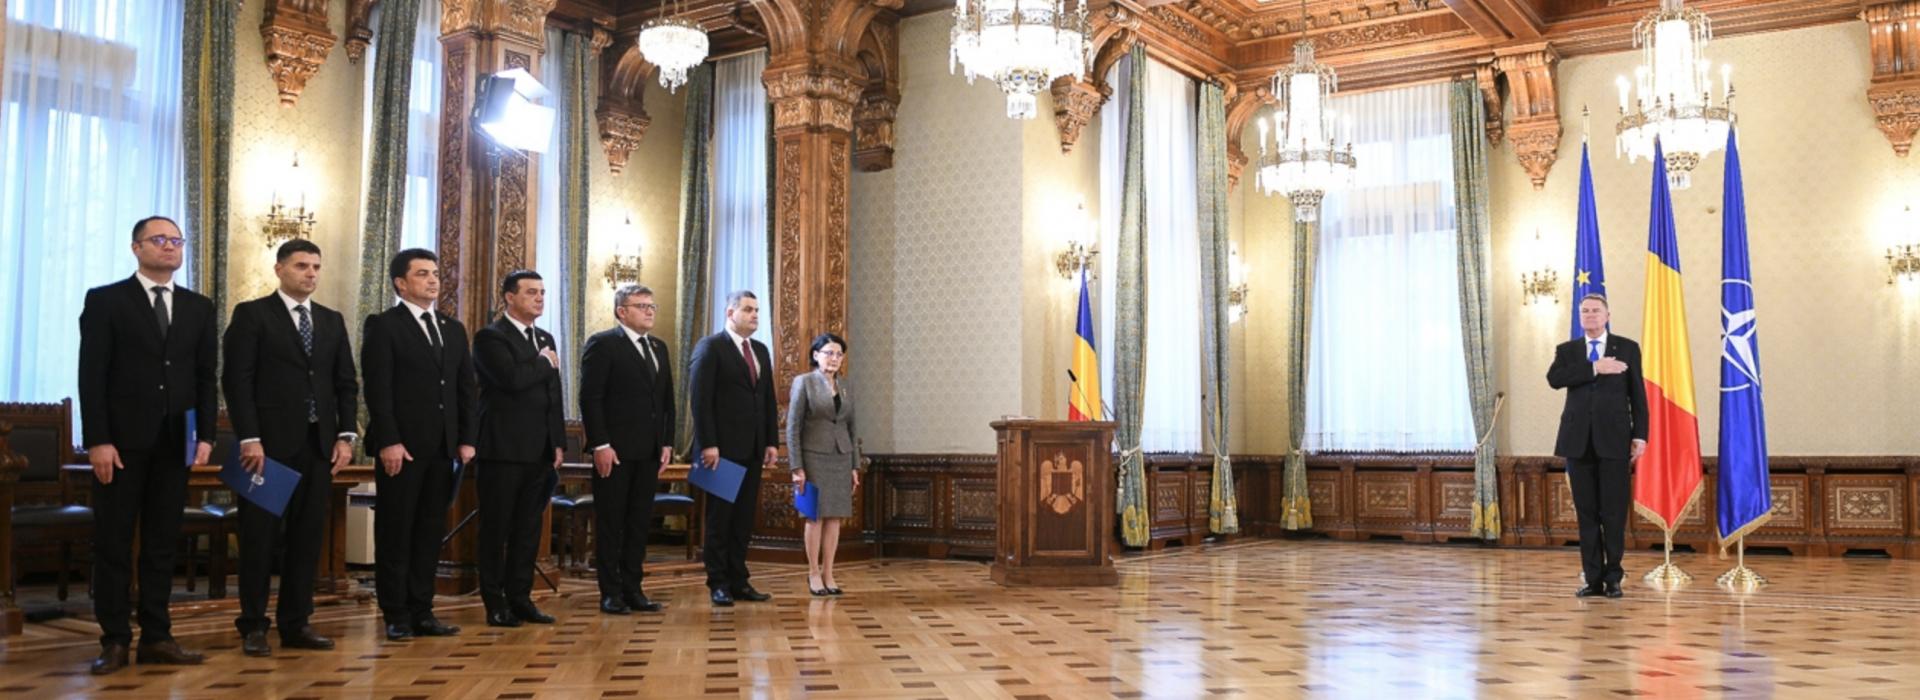 Depunere jurământ miniștri Cotroceni, 20 noiembrie